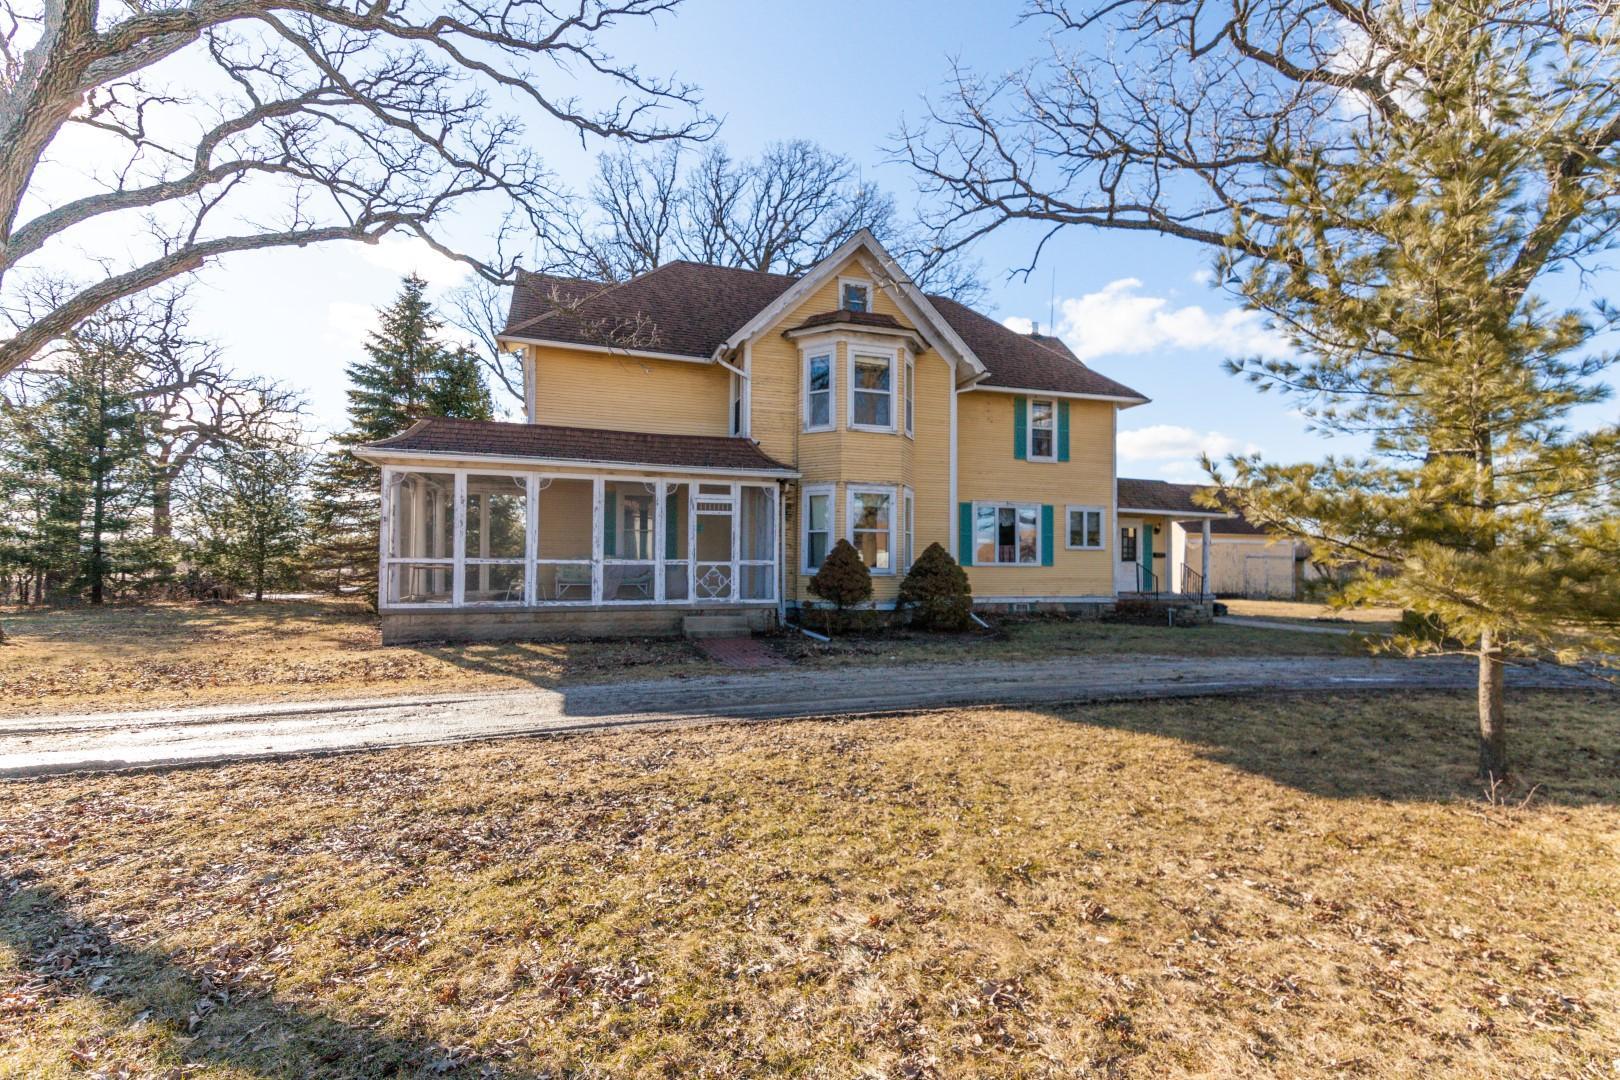 37214 Delafield Rd, Summit, Wisconsin 53066, 3 Bedrooms Bedrooms, 7 Rooms Rooms,3 BathroomsBathrooms,Single-Family,For Sale,Delafield Rd,1630194